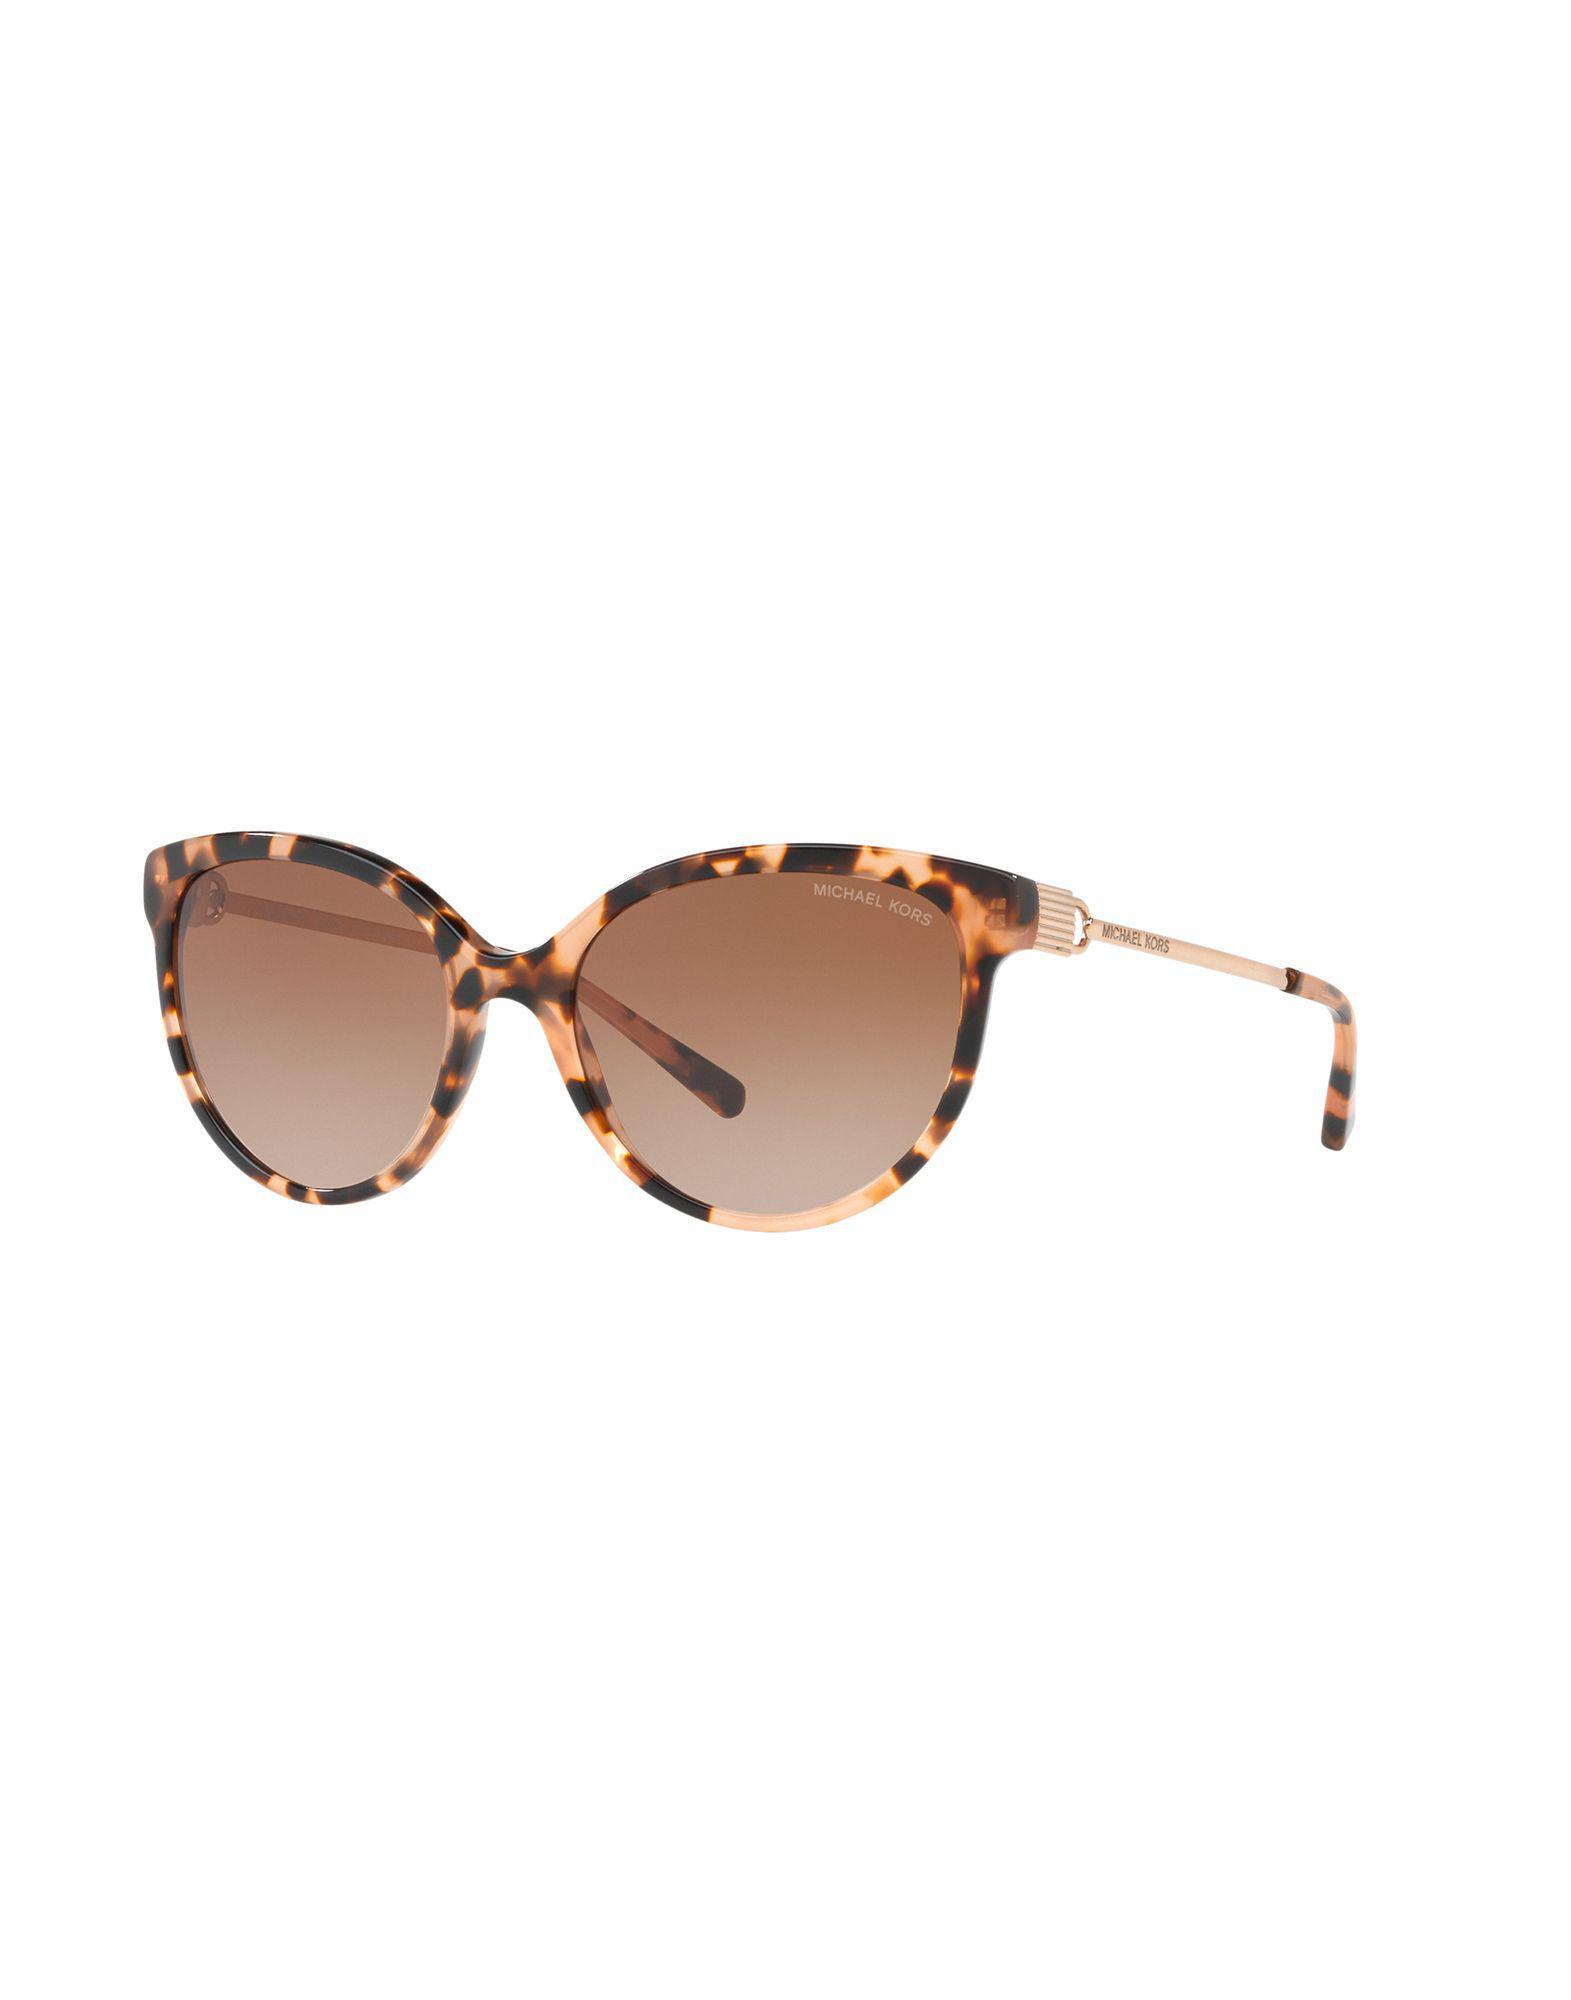 78b16509a2 Michael Kors - Brown Sunglasses - Lyst. View fullscreen